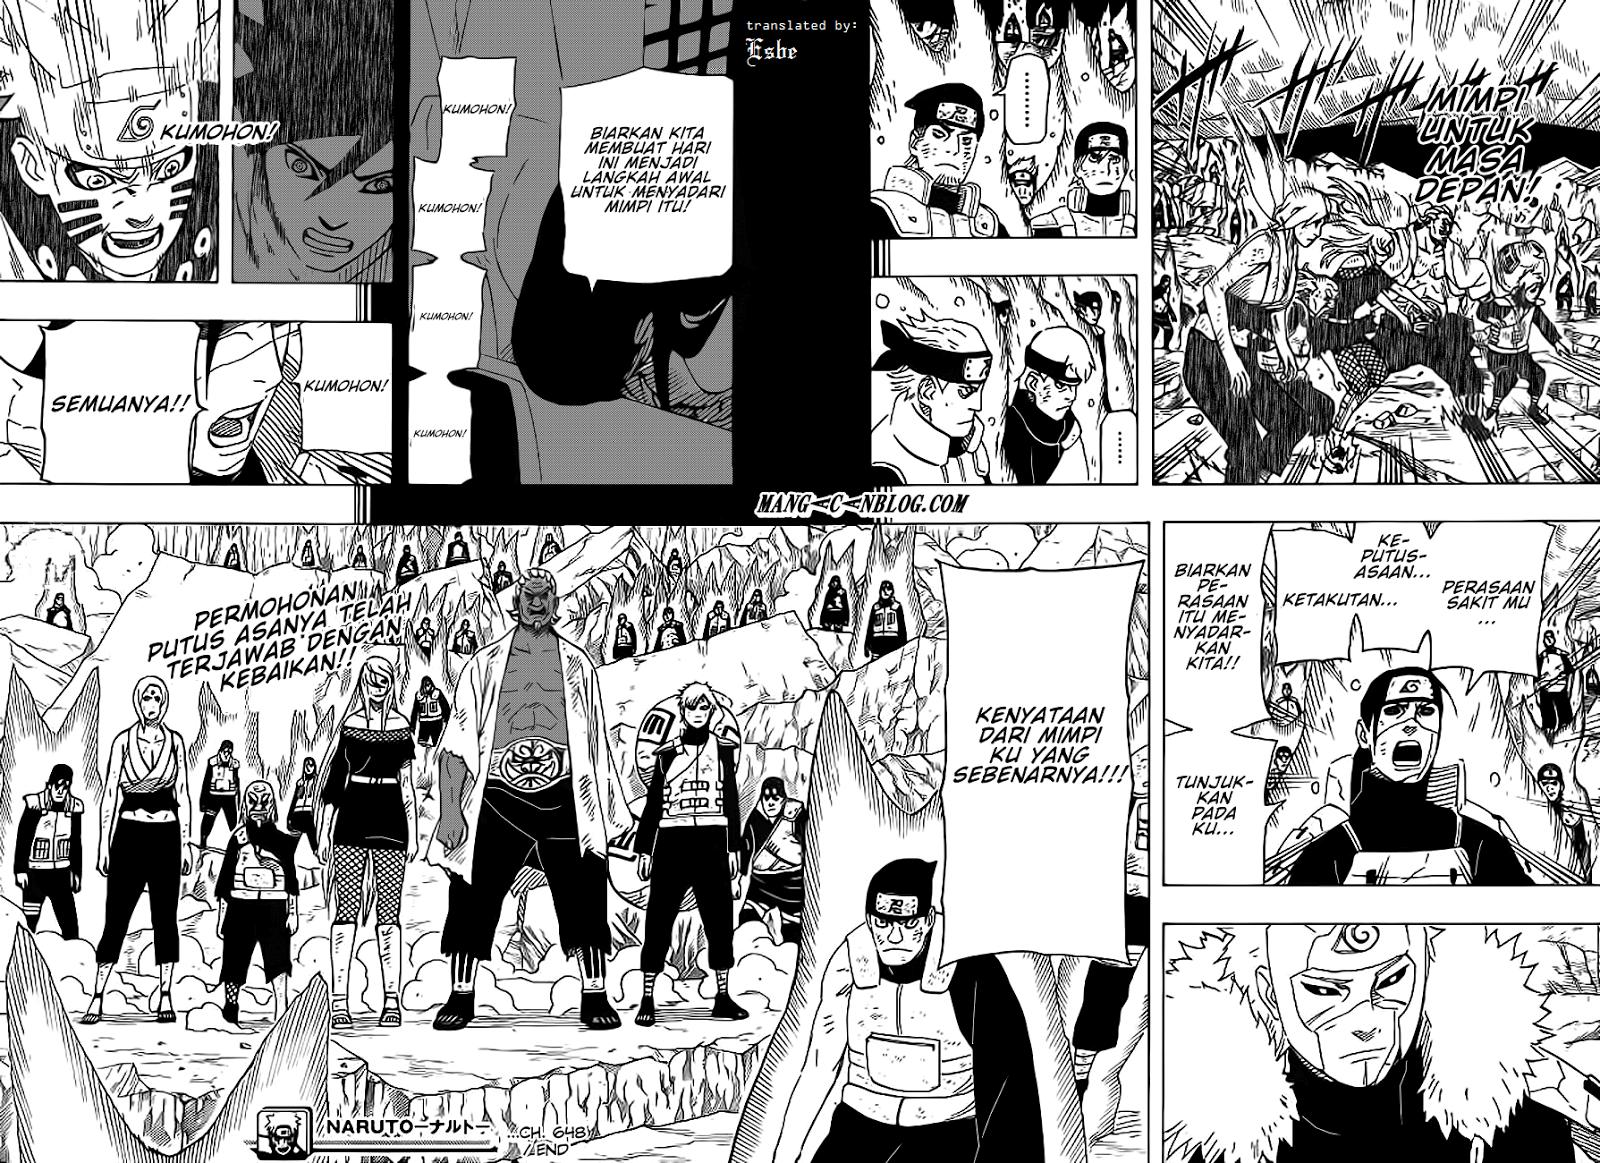 Komik naruto 648 - impian seorang shinobi 649 Indonesia naruto 648 - impian seorang shinobi Terbaru 12|Baca Manga Komik Indonesia|Mangacan